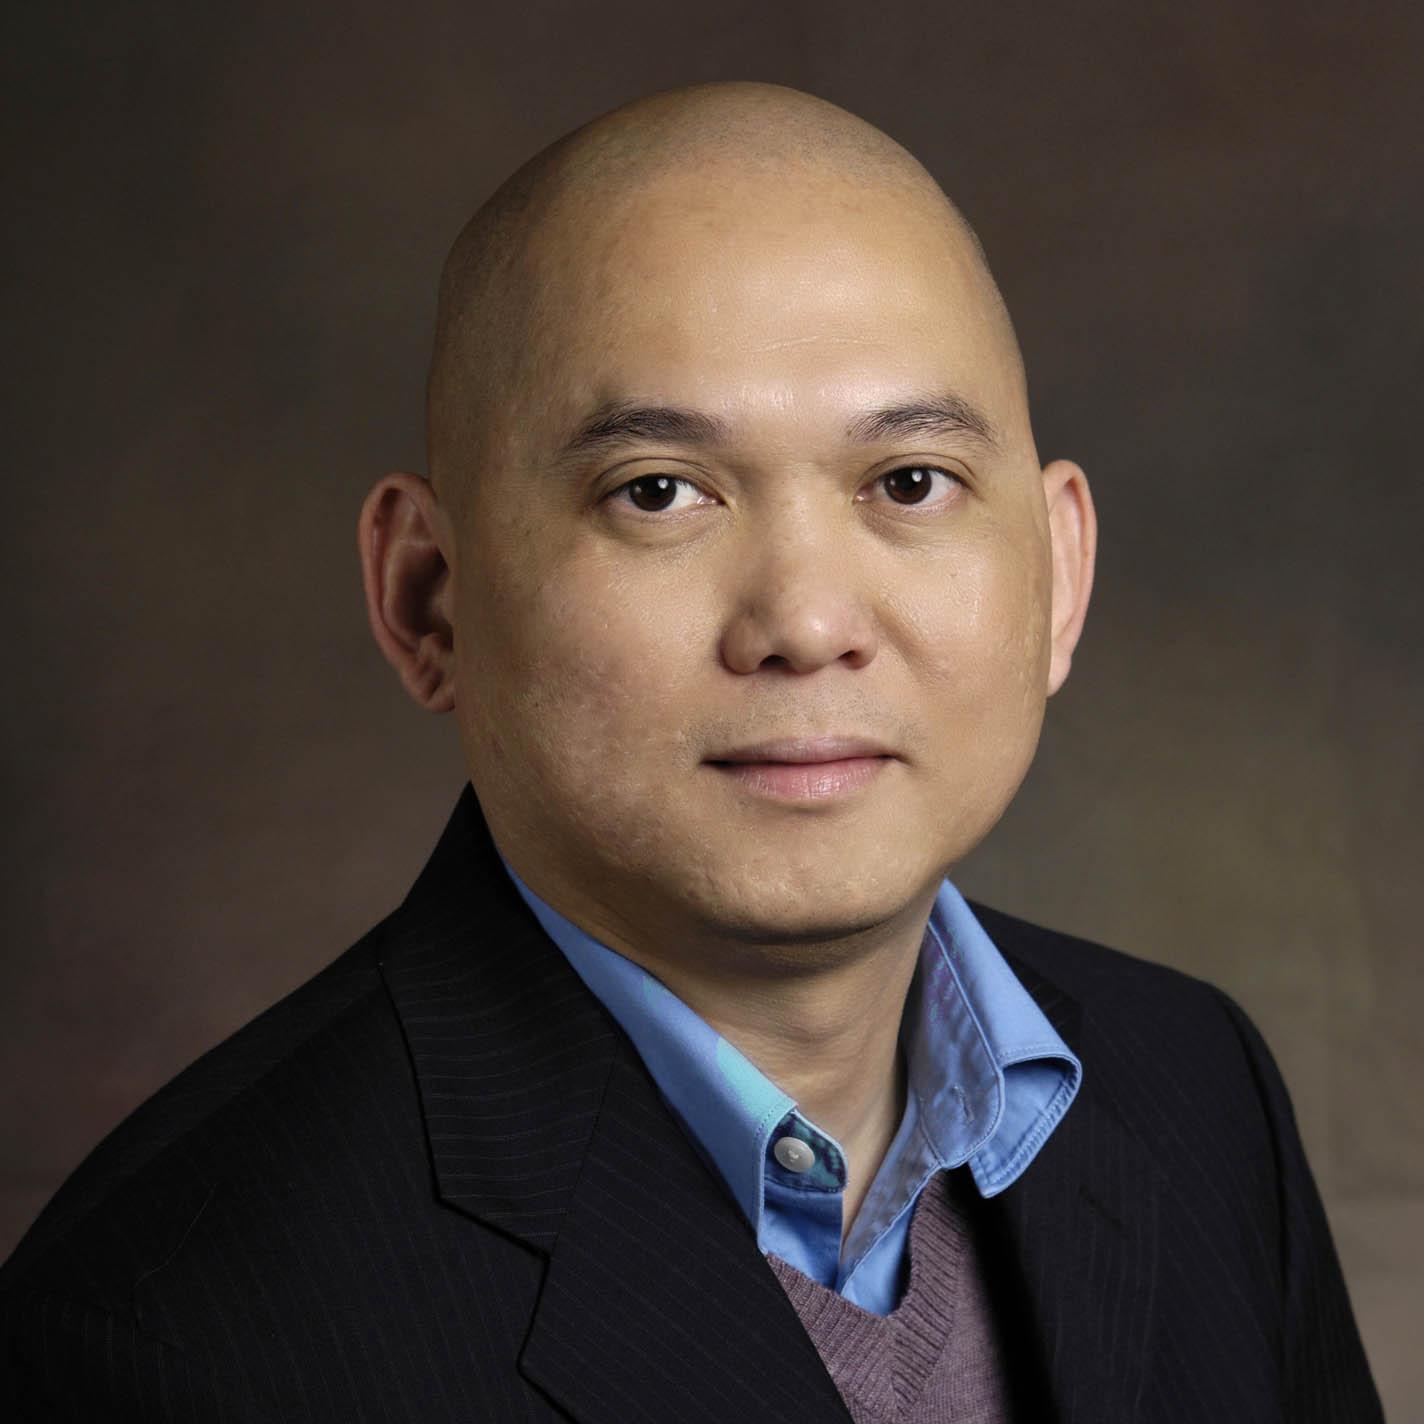 WesternU professor awarded $100,000 PhRMA Foundation grant